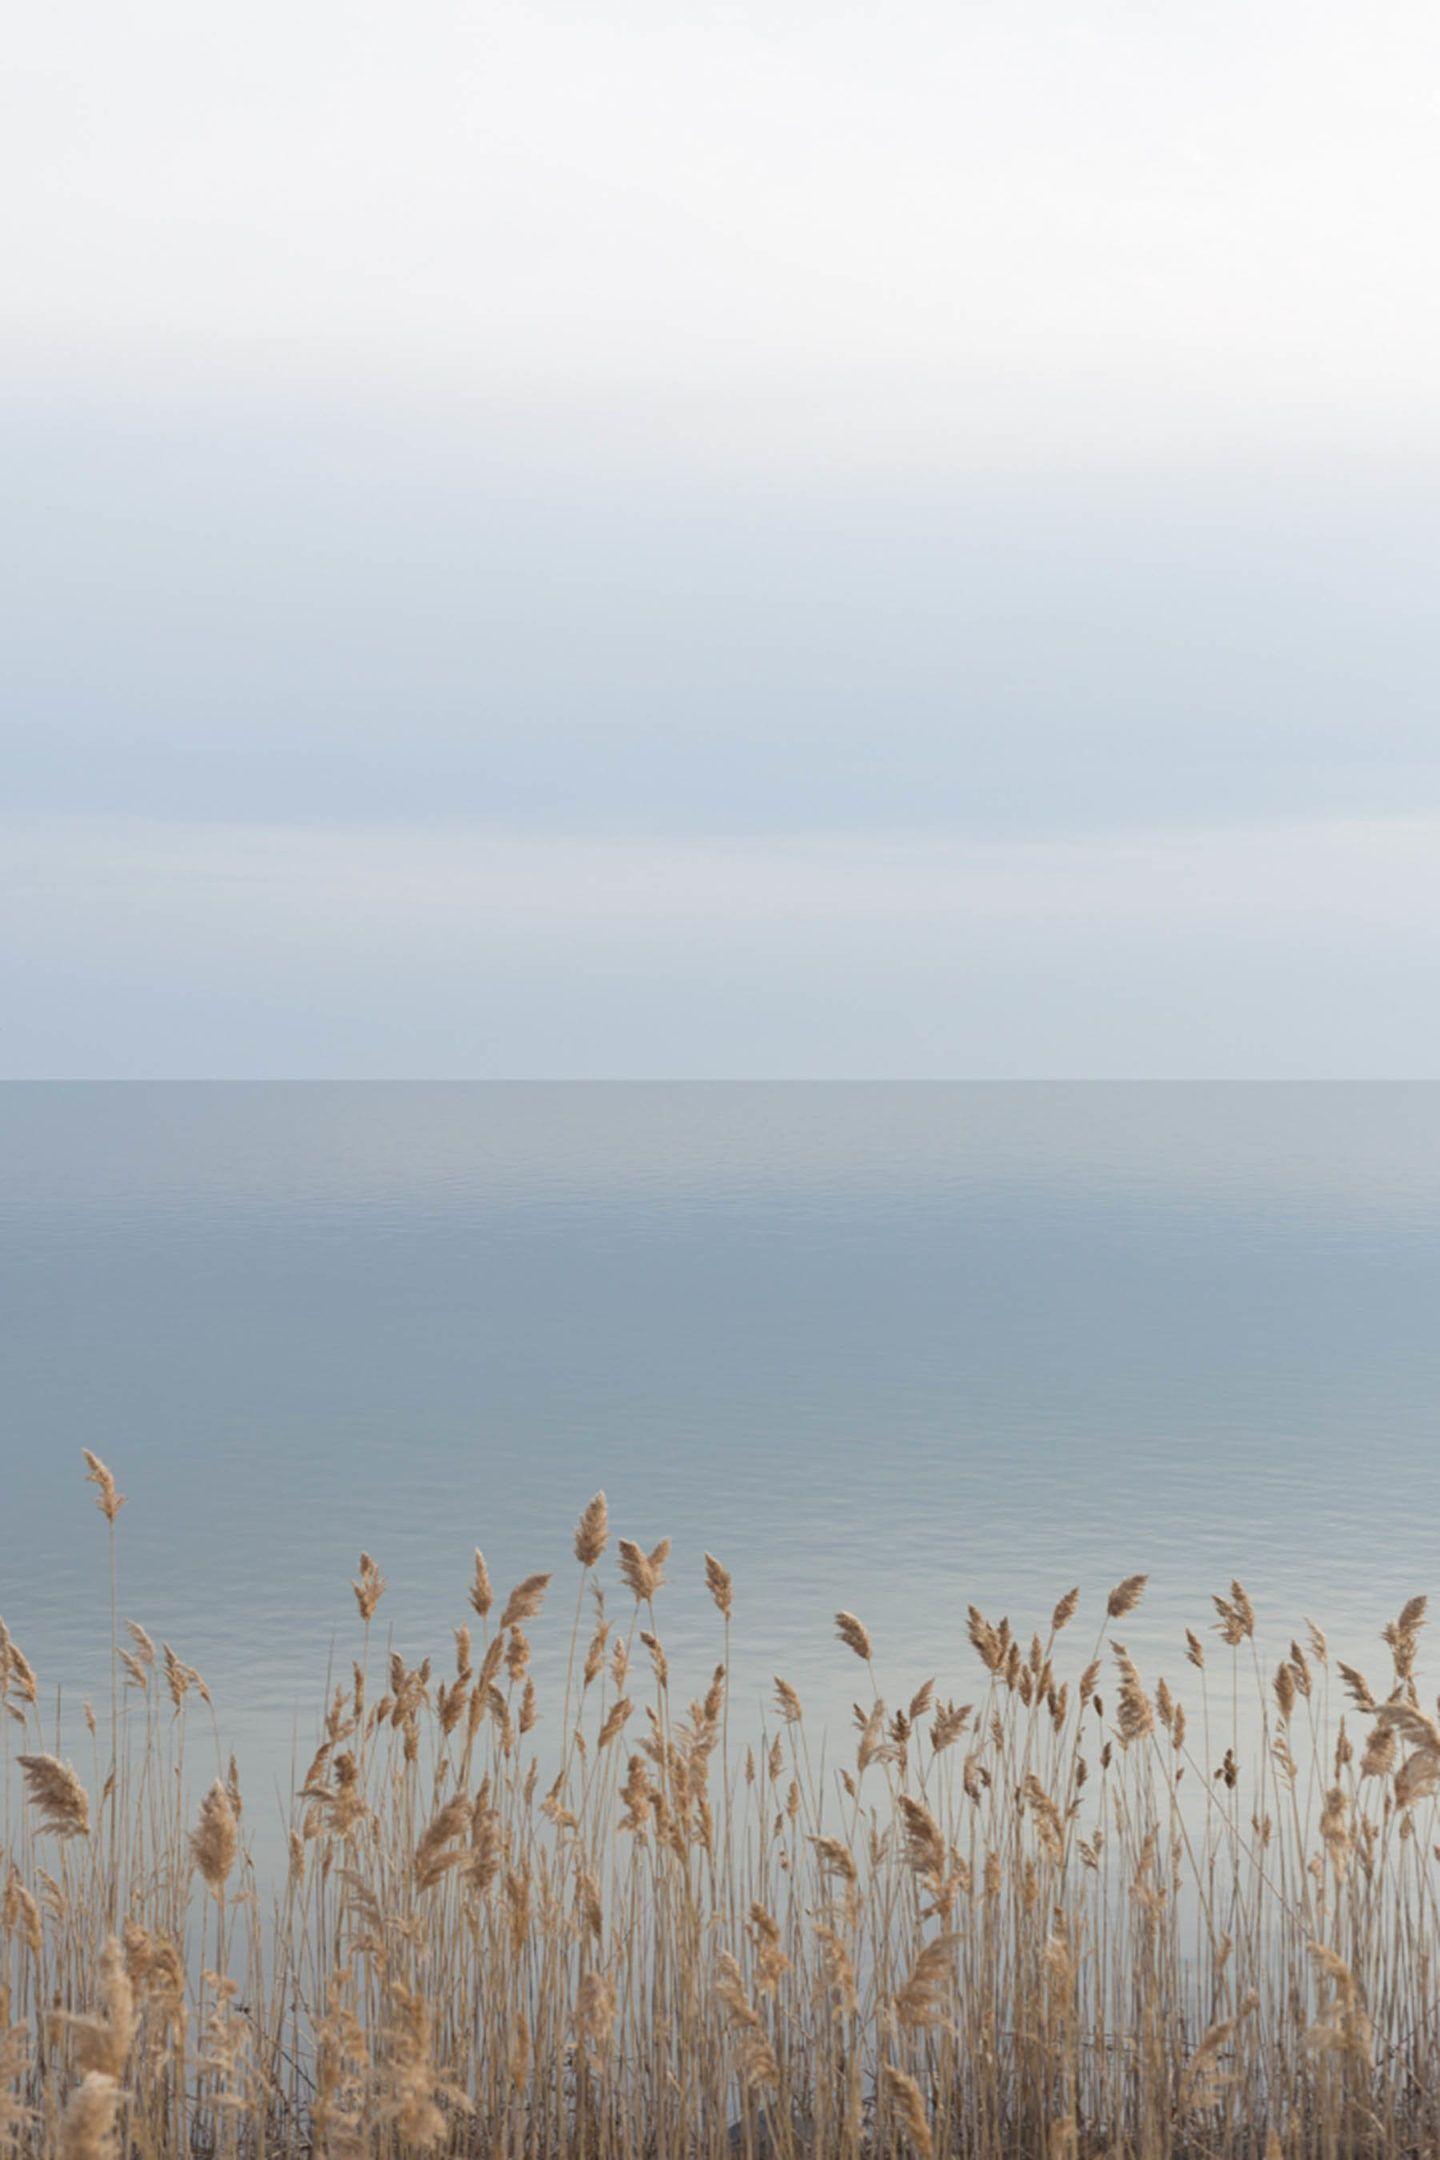 IGNANT-Photography-Naohiro-Maeda-Passages-007